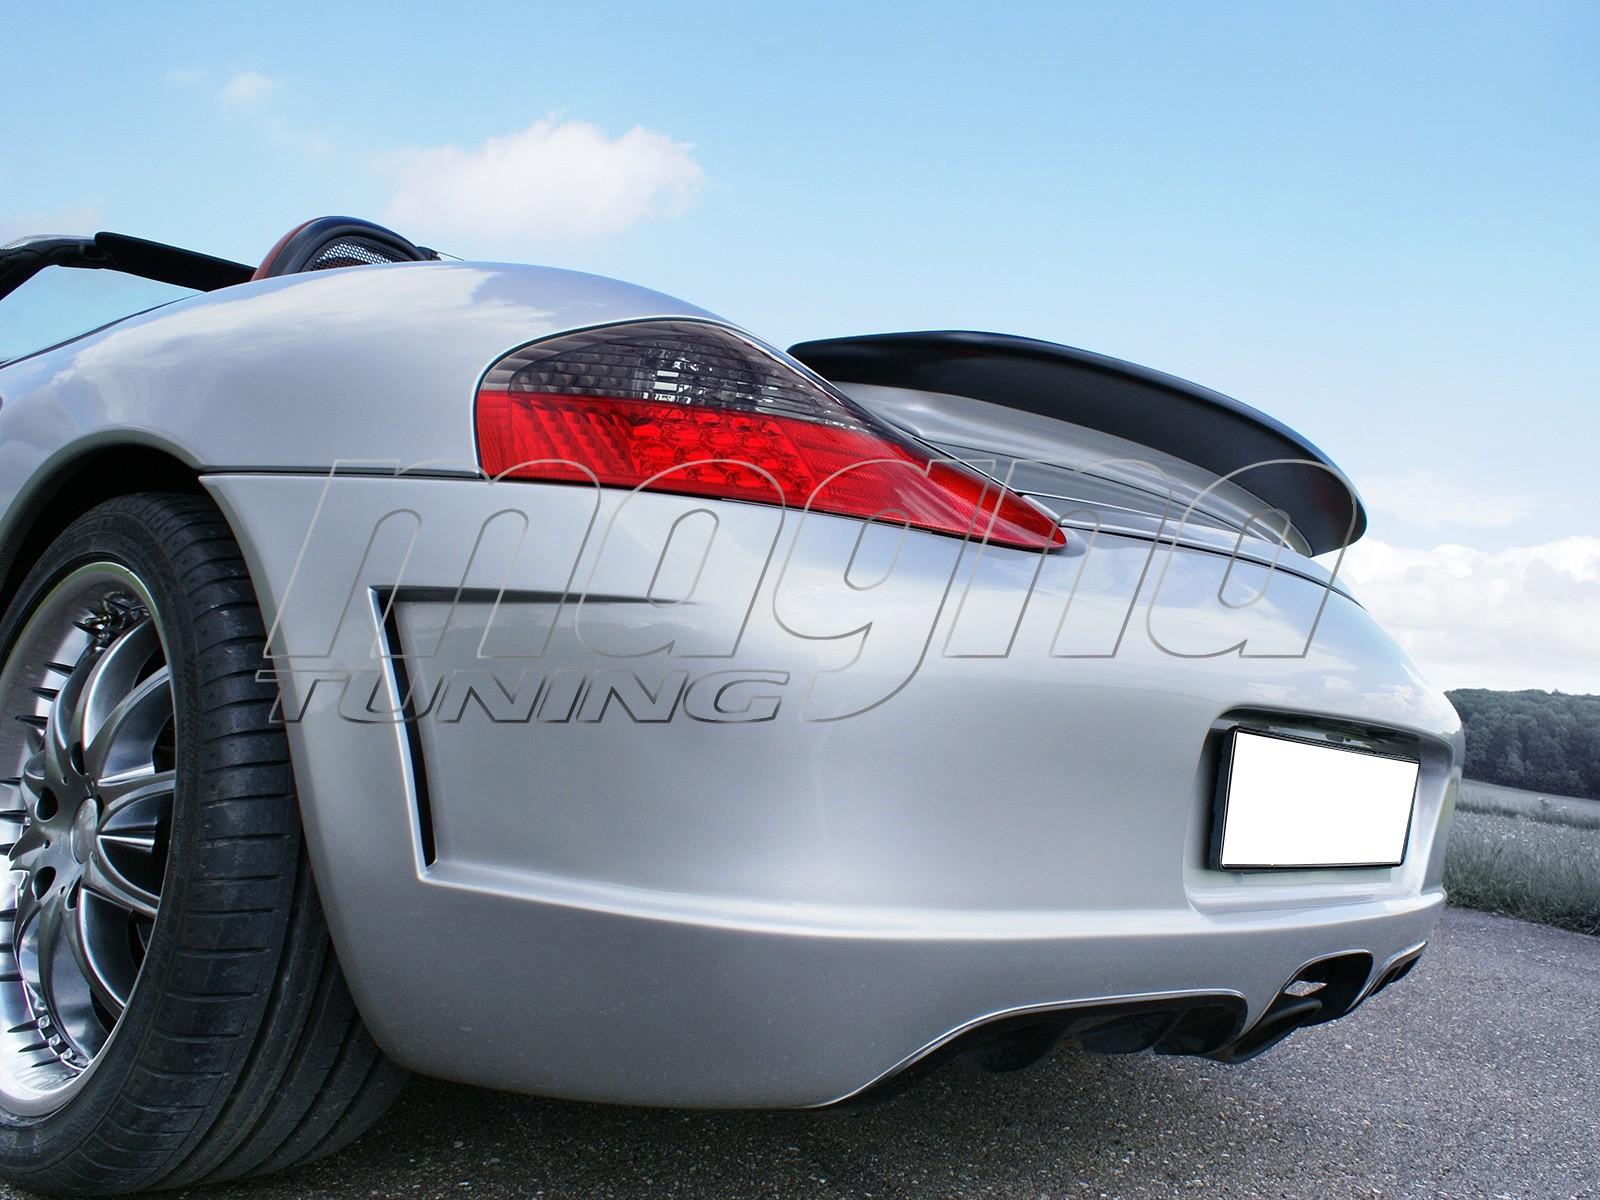 Porsche Boxster 986 Body Kit GTS